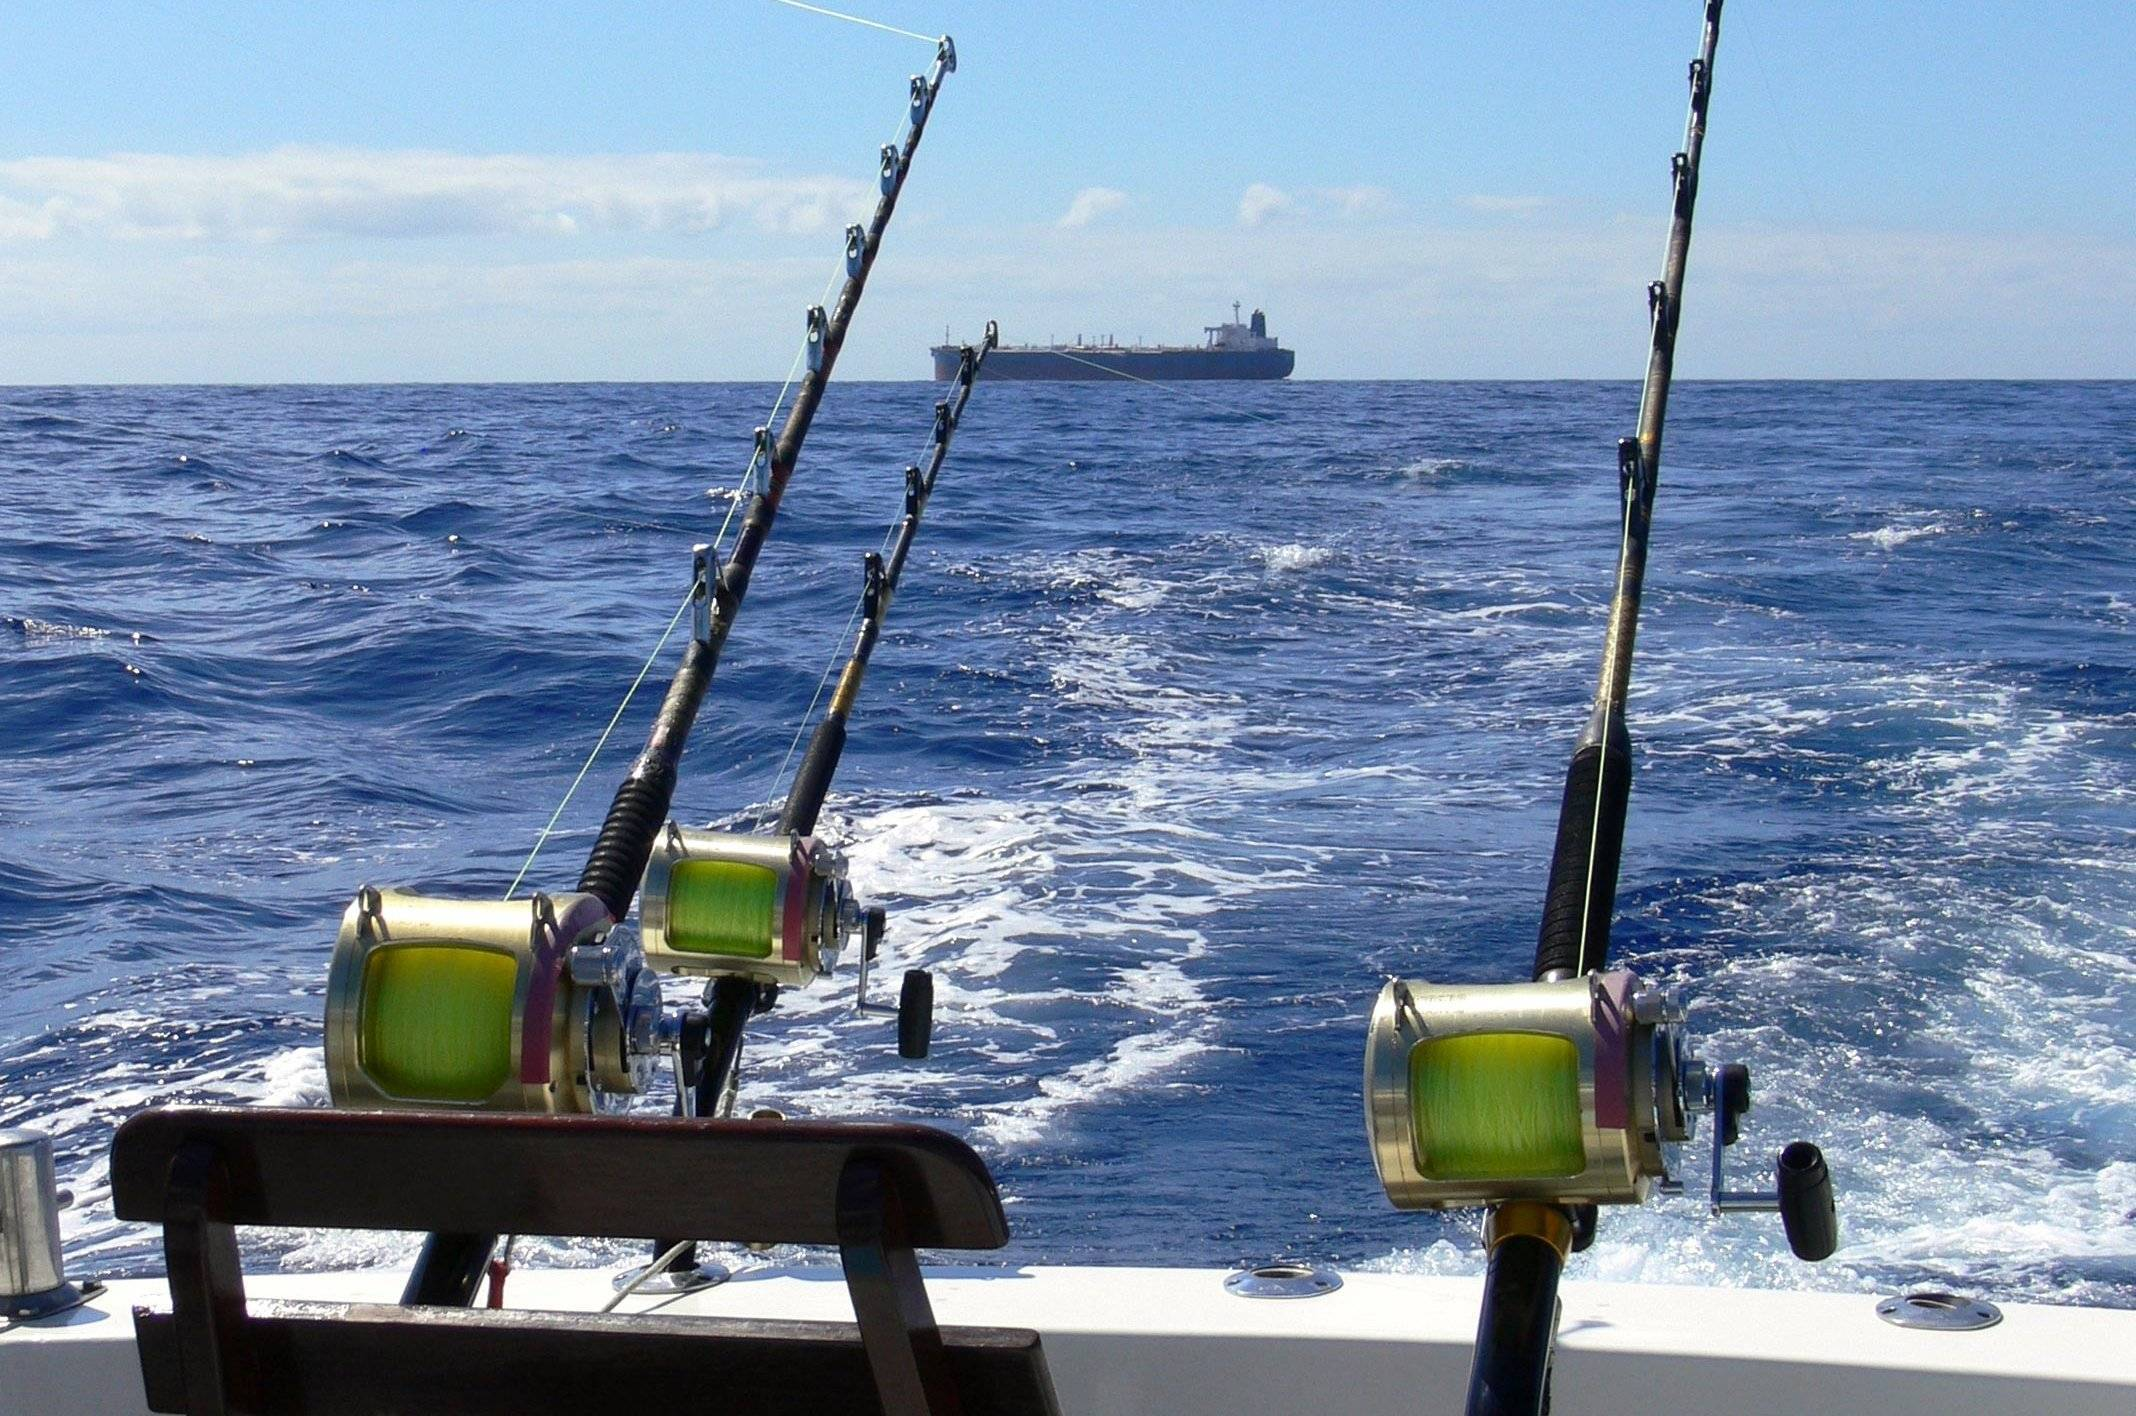 Ловля судака на троллинг: (снасти для троллинга и скорость лодки)